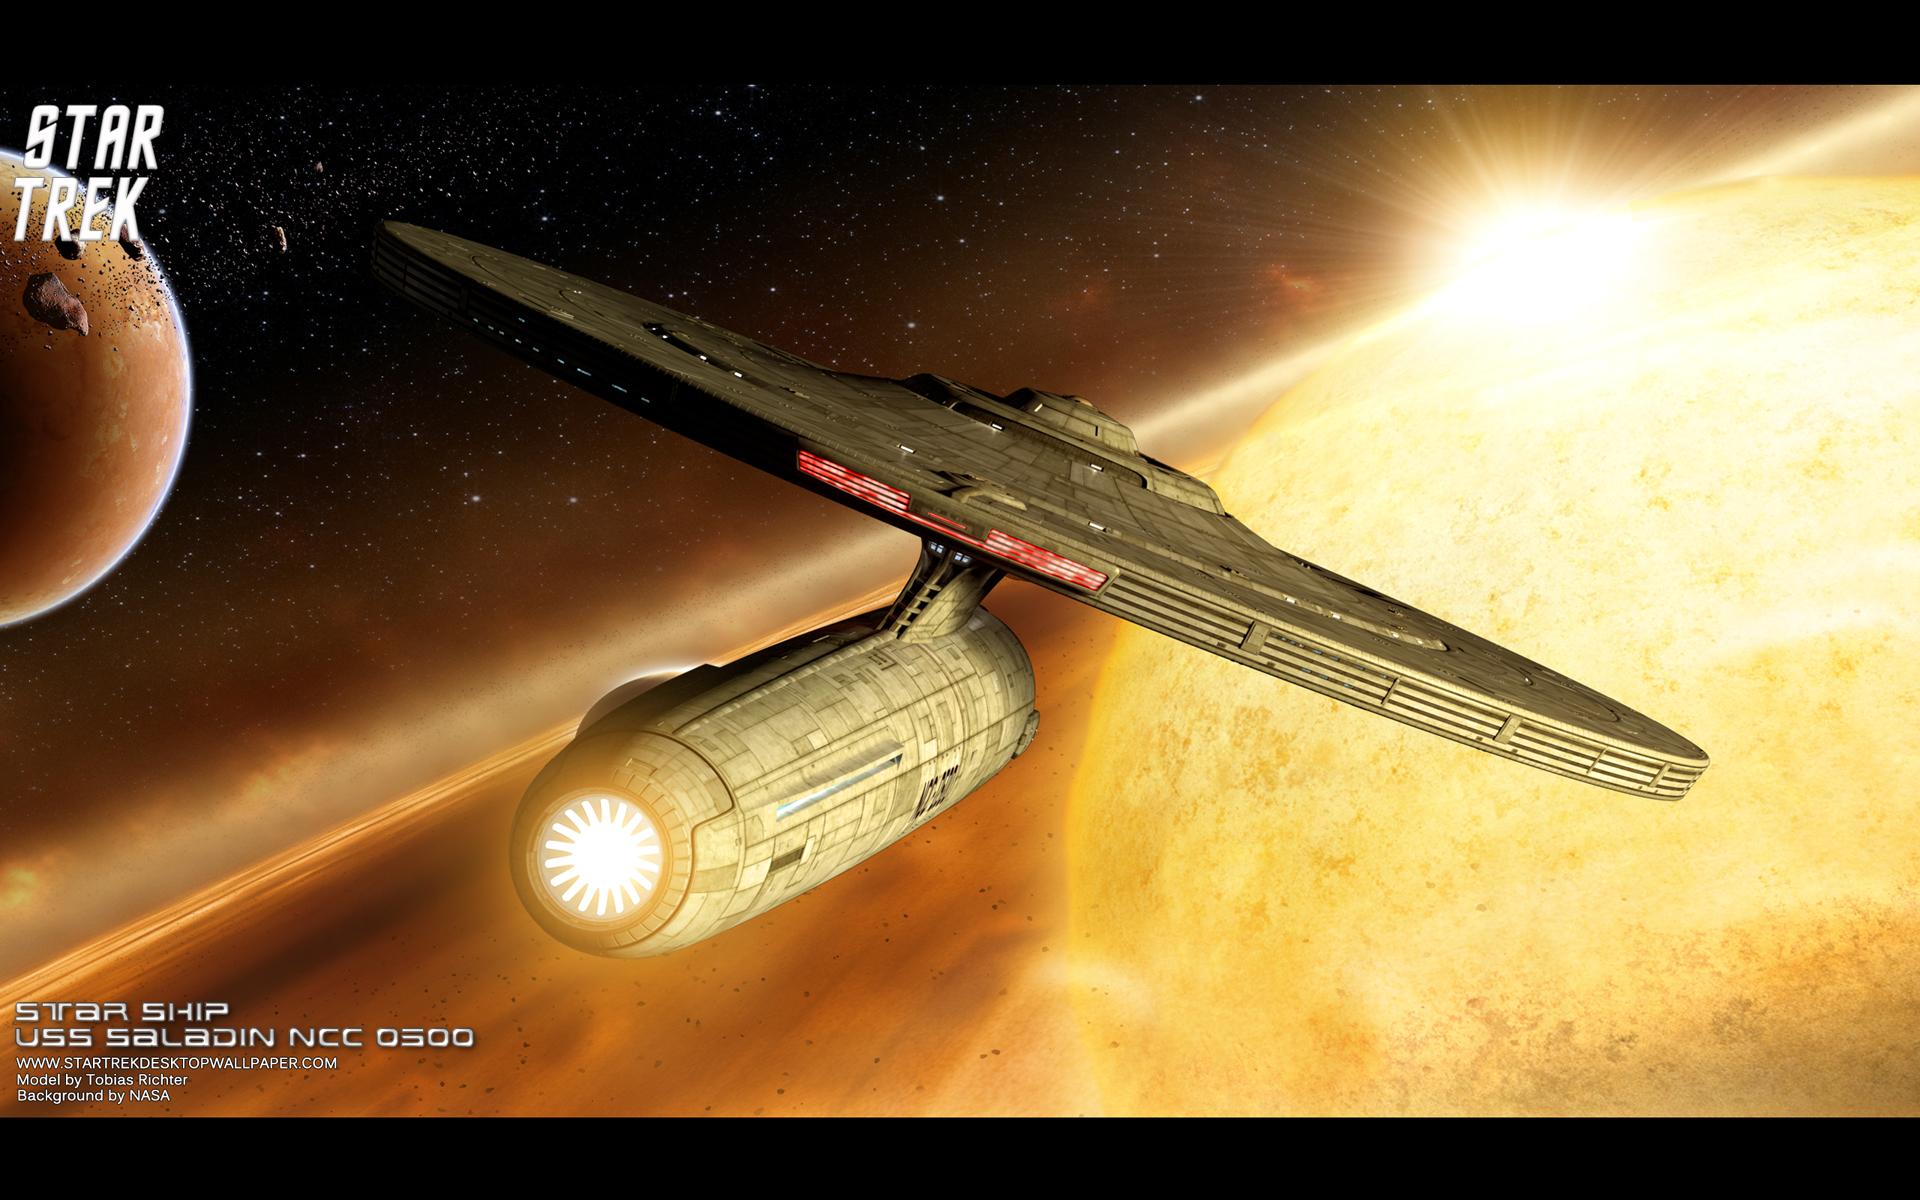 Star Trek Ships wallpaper   309292 1920x1200